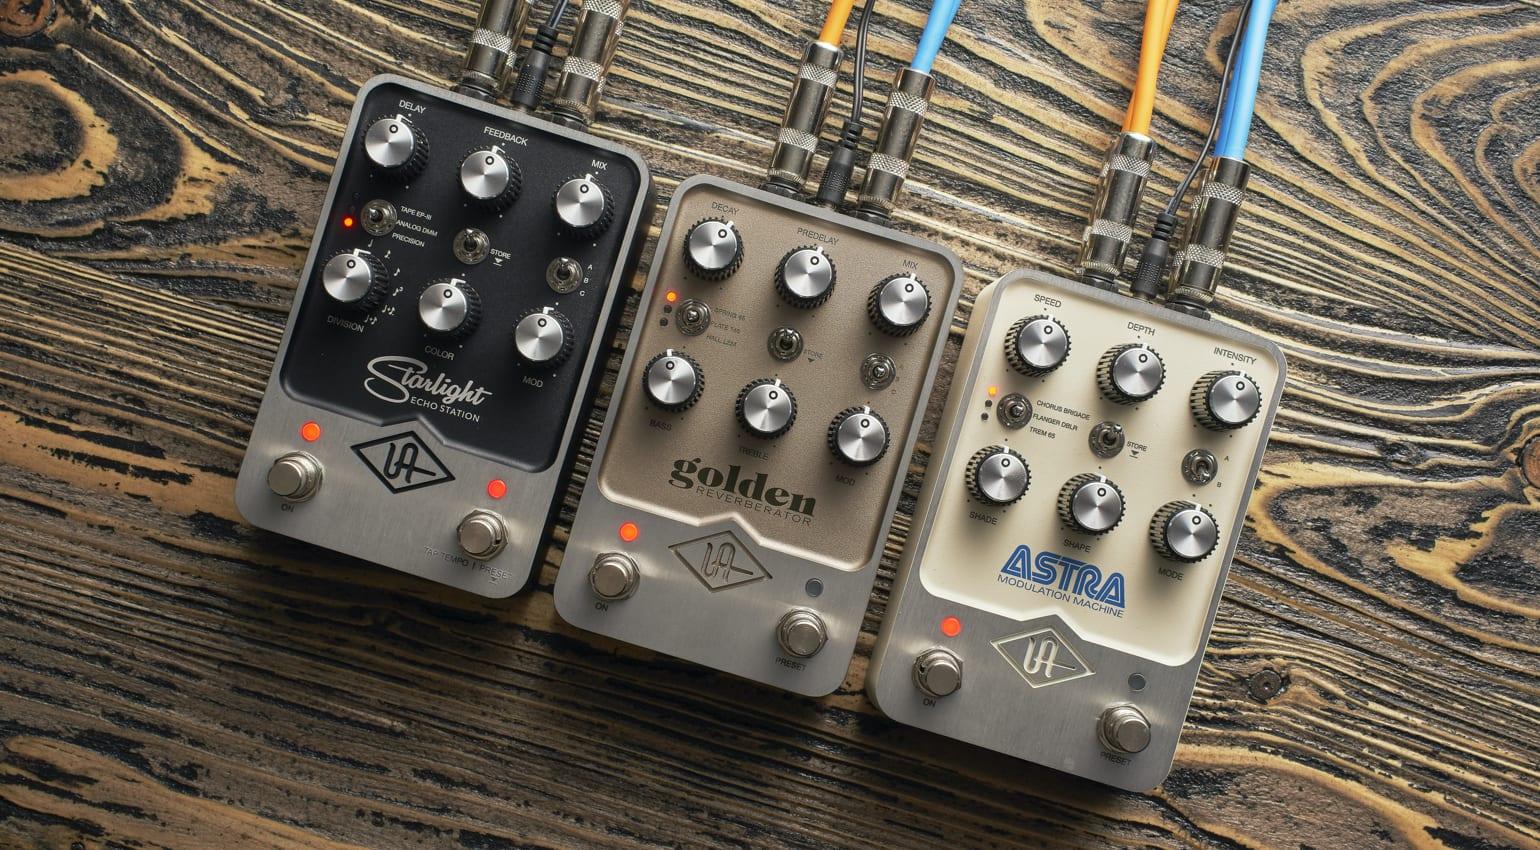 UAFX Pedals Golden Reverberator, Starlight Echo Station, and Astra Modulation Machine